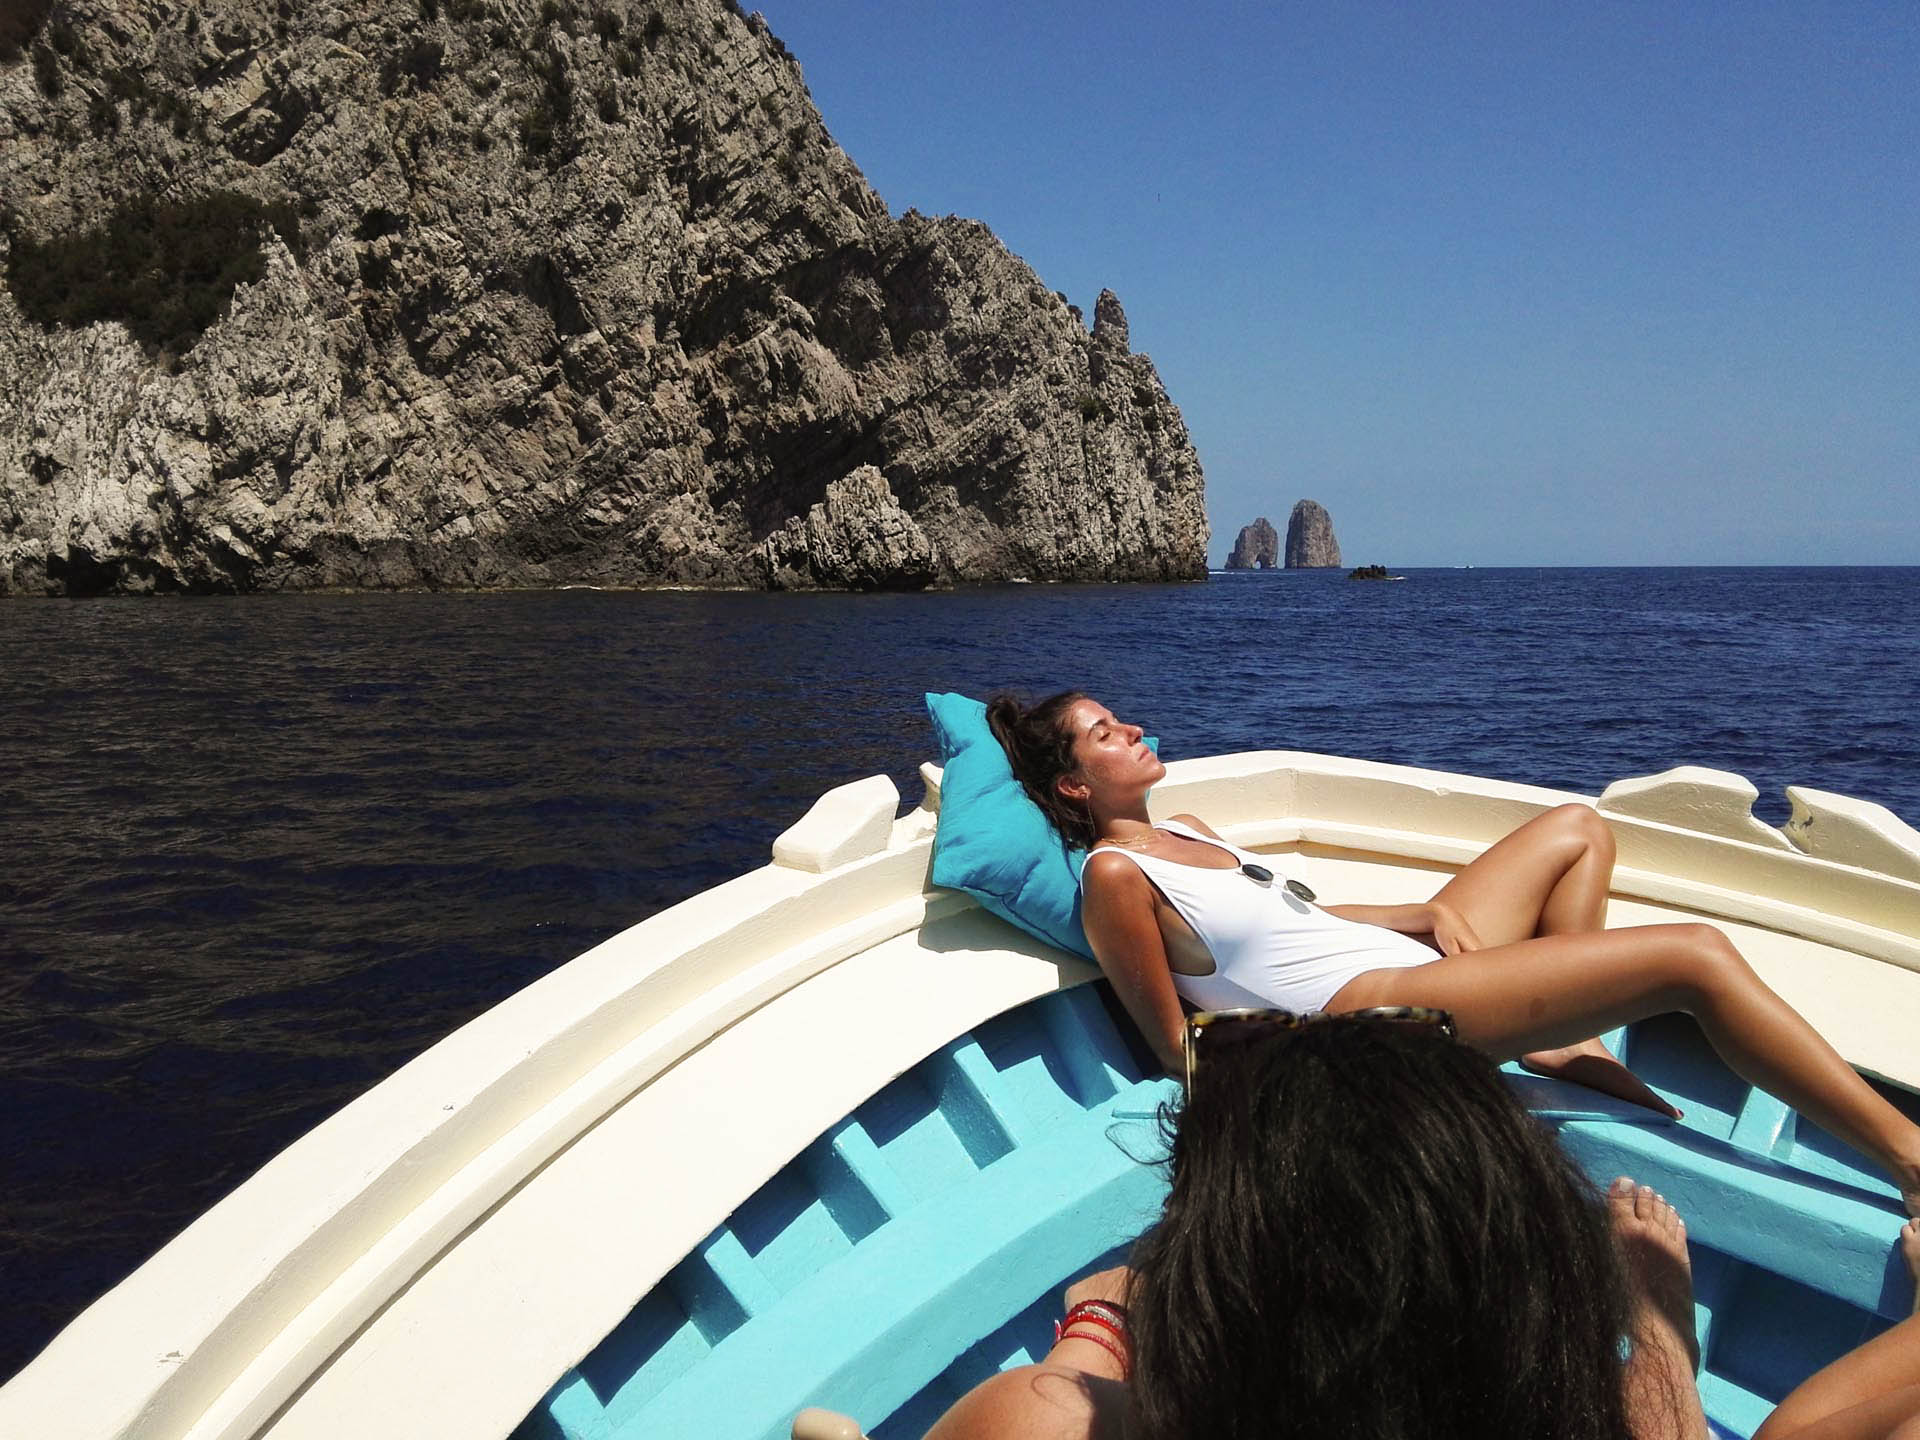 Sunbathing on the boat near Capri